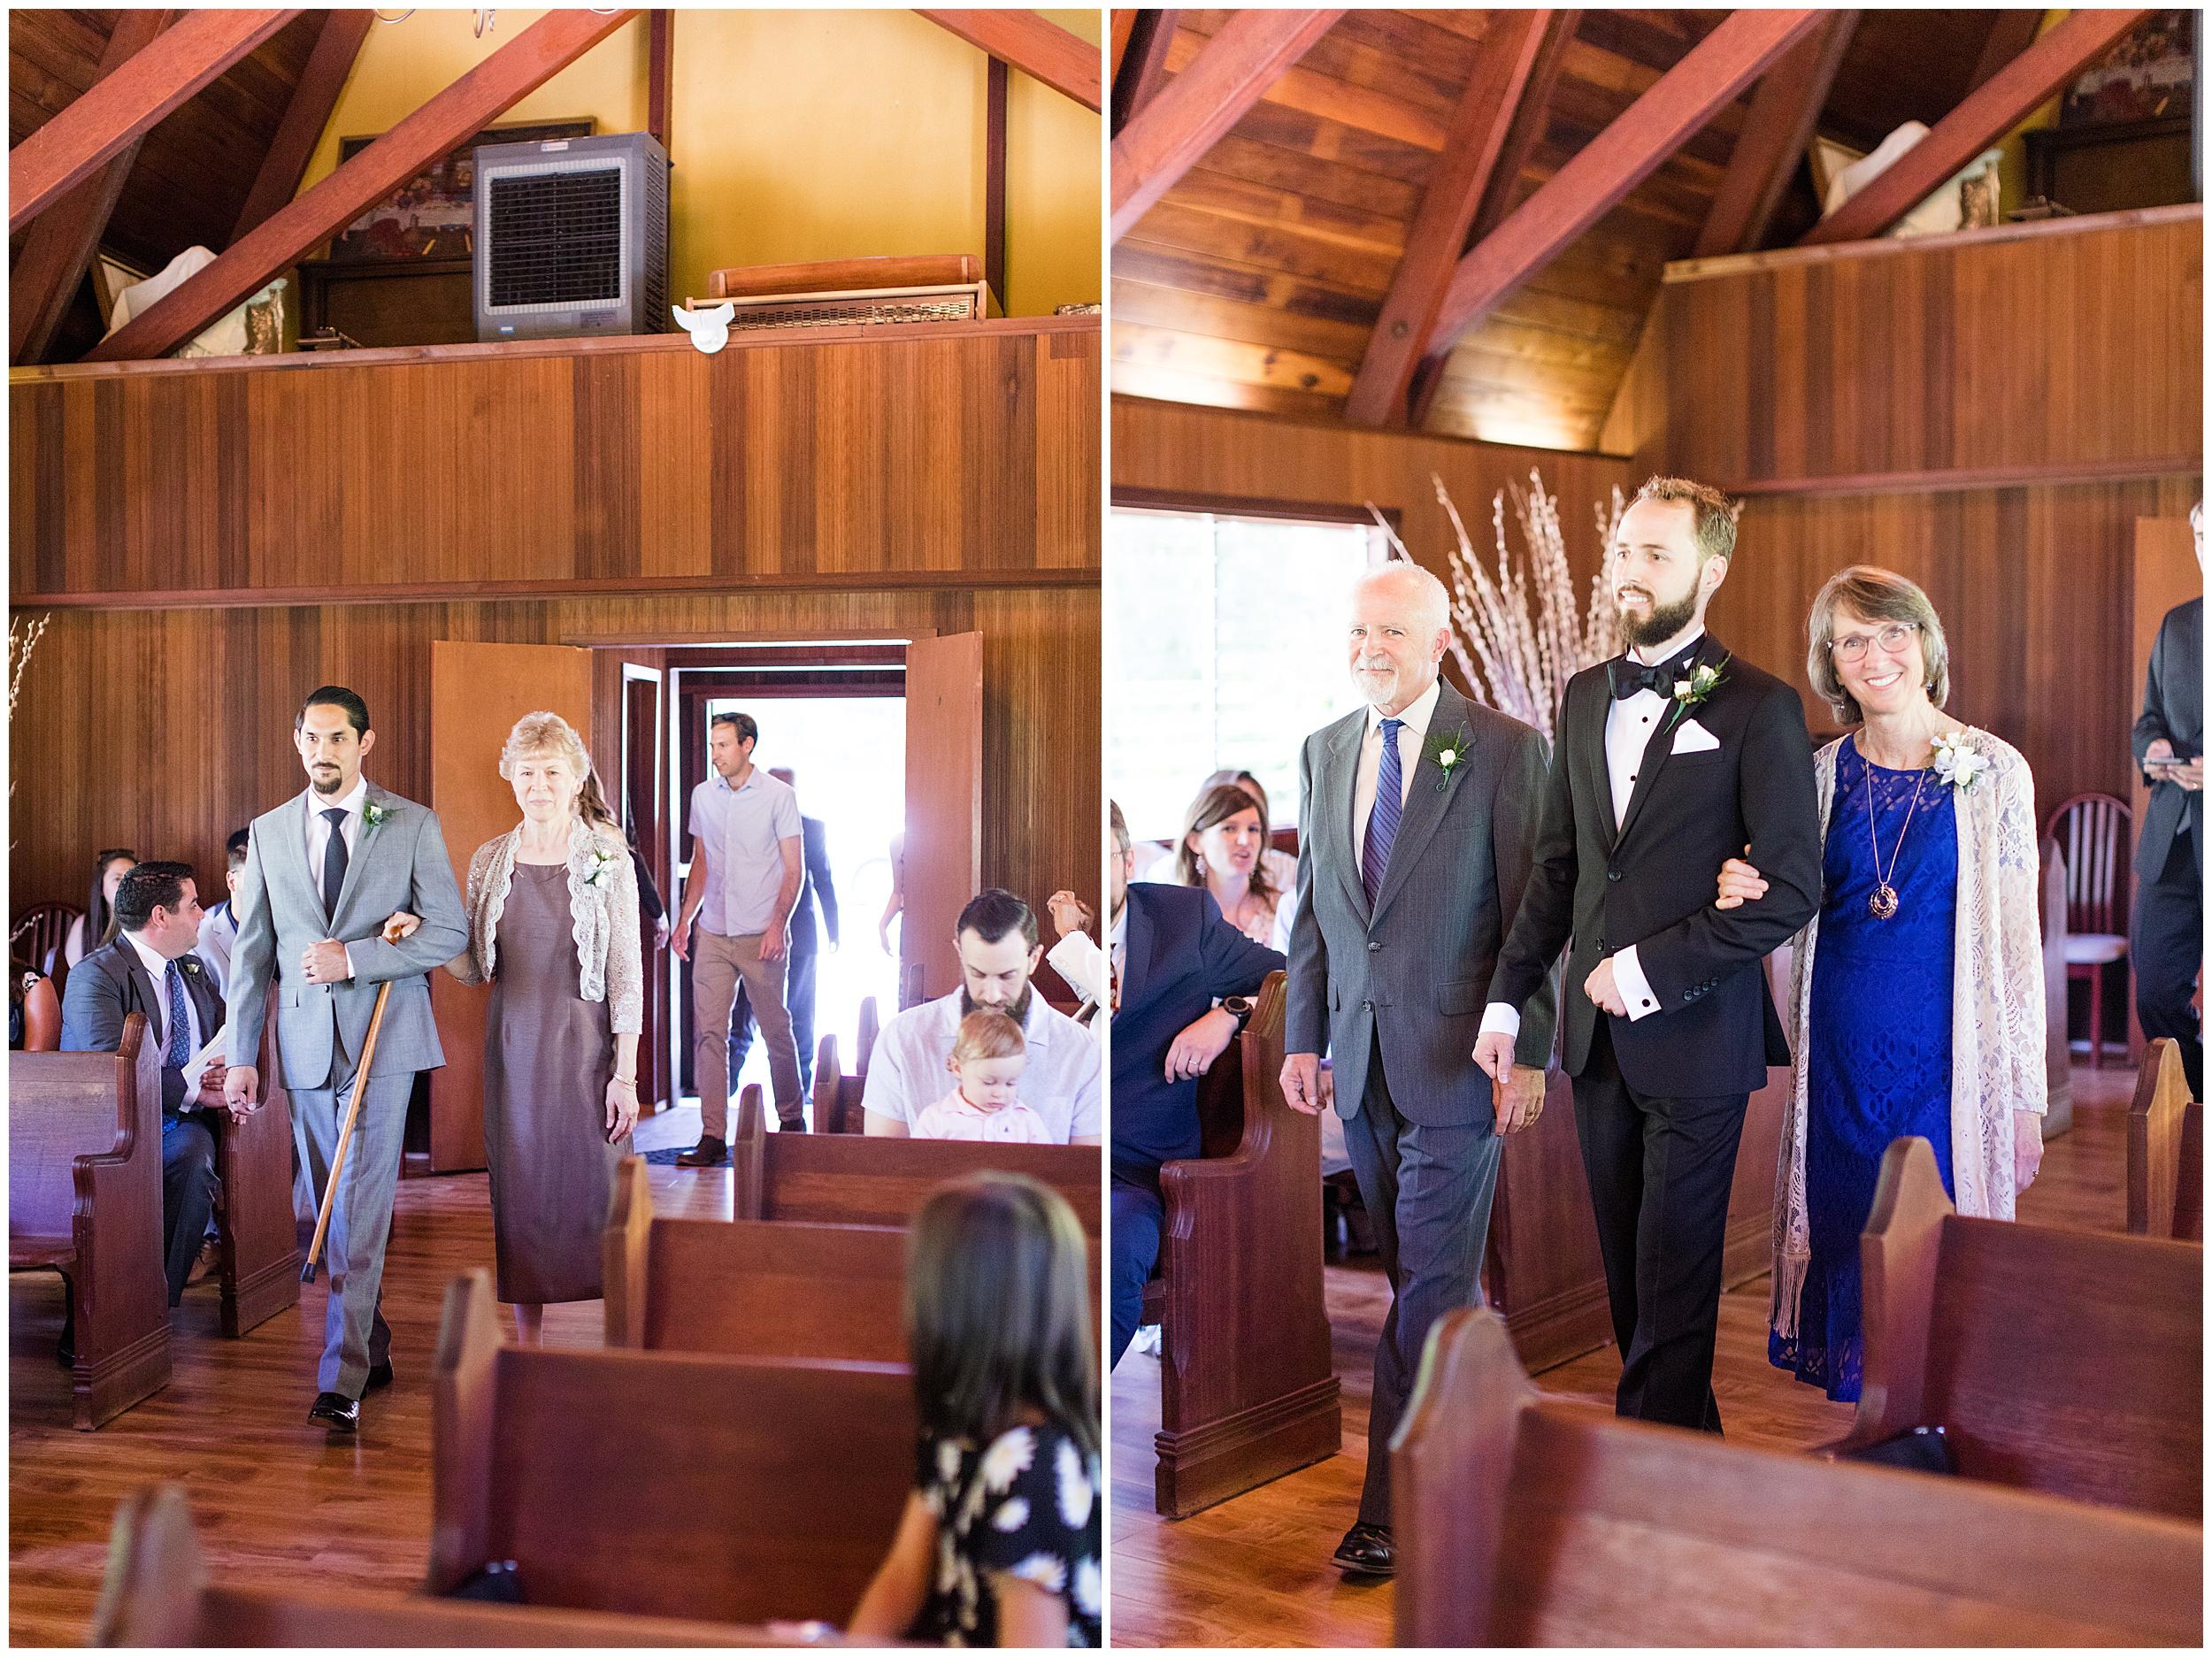 2019 chapel on the hill los gatos san jose bay area wedding photographer angela sue photography_0024.jpg